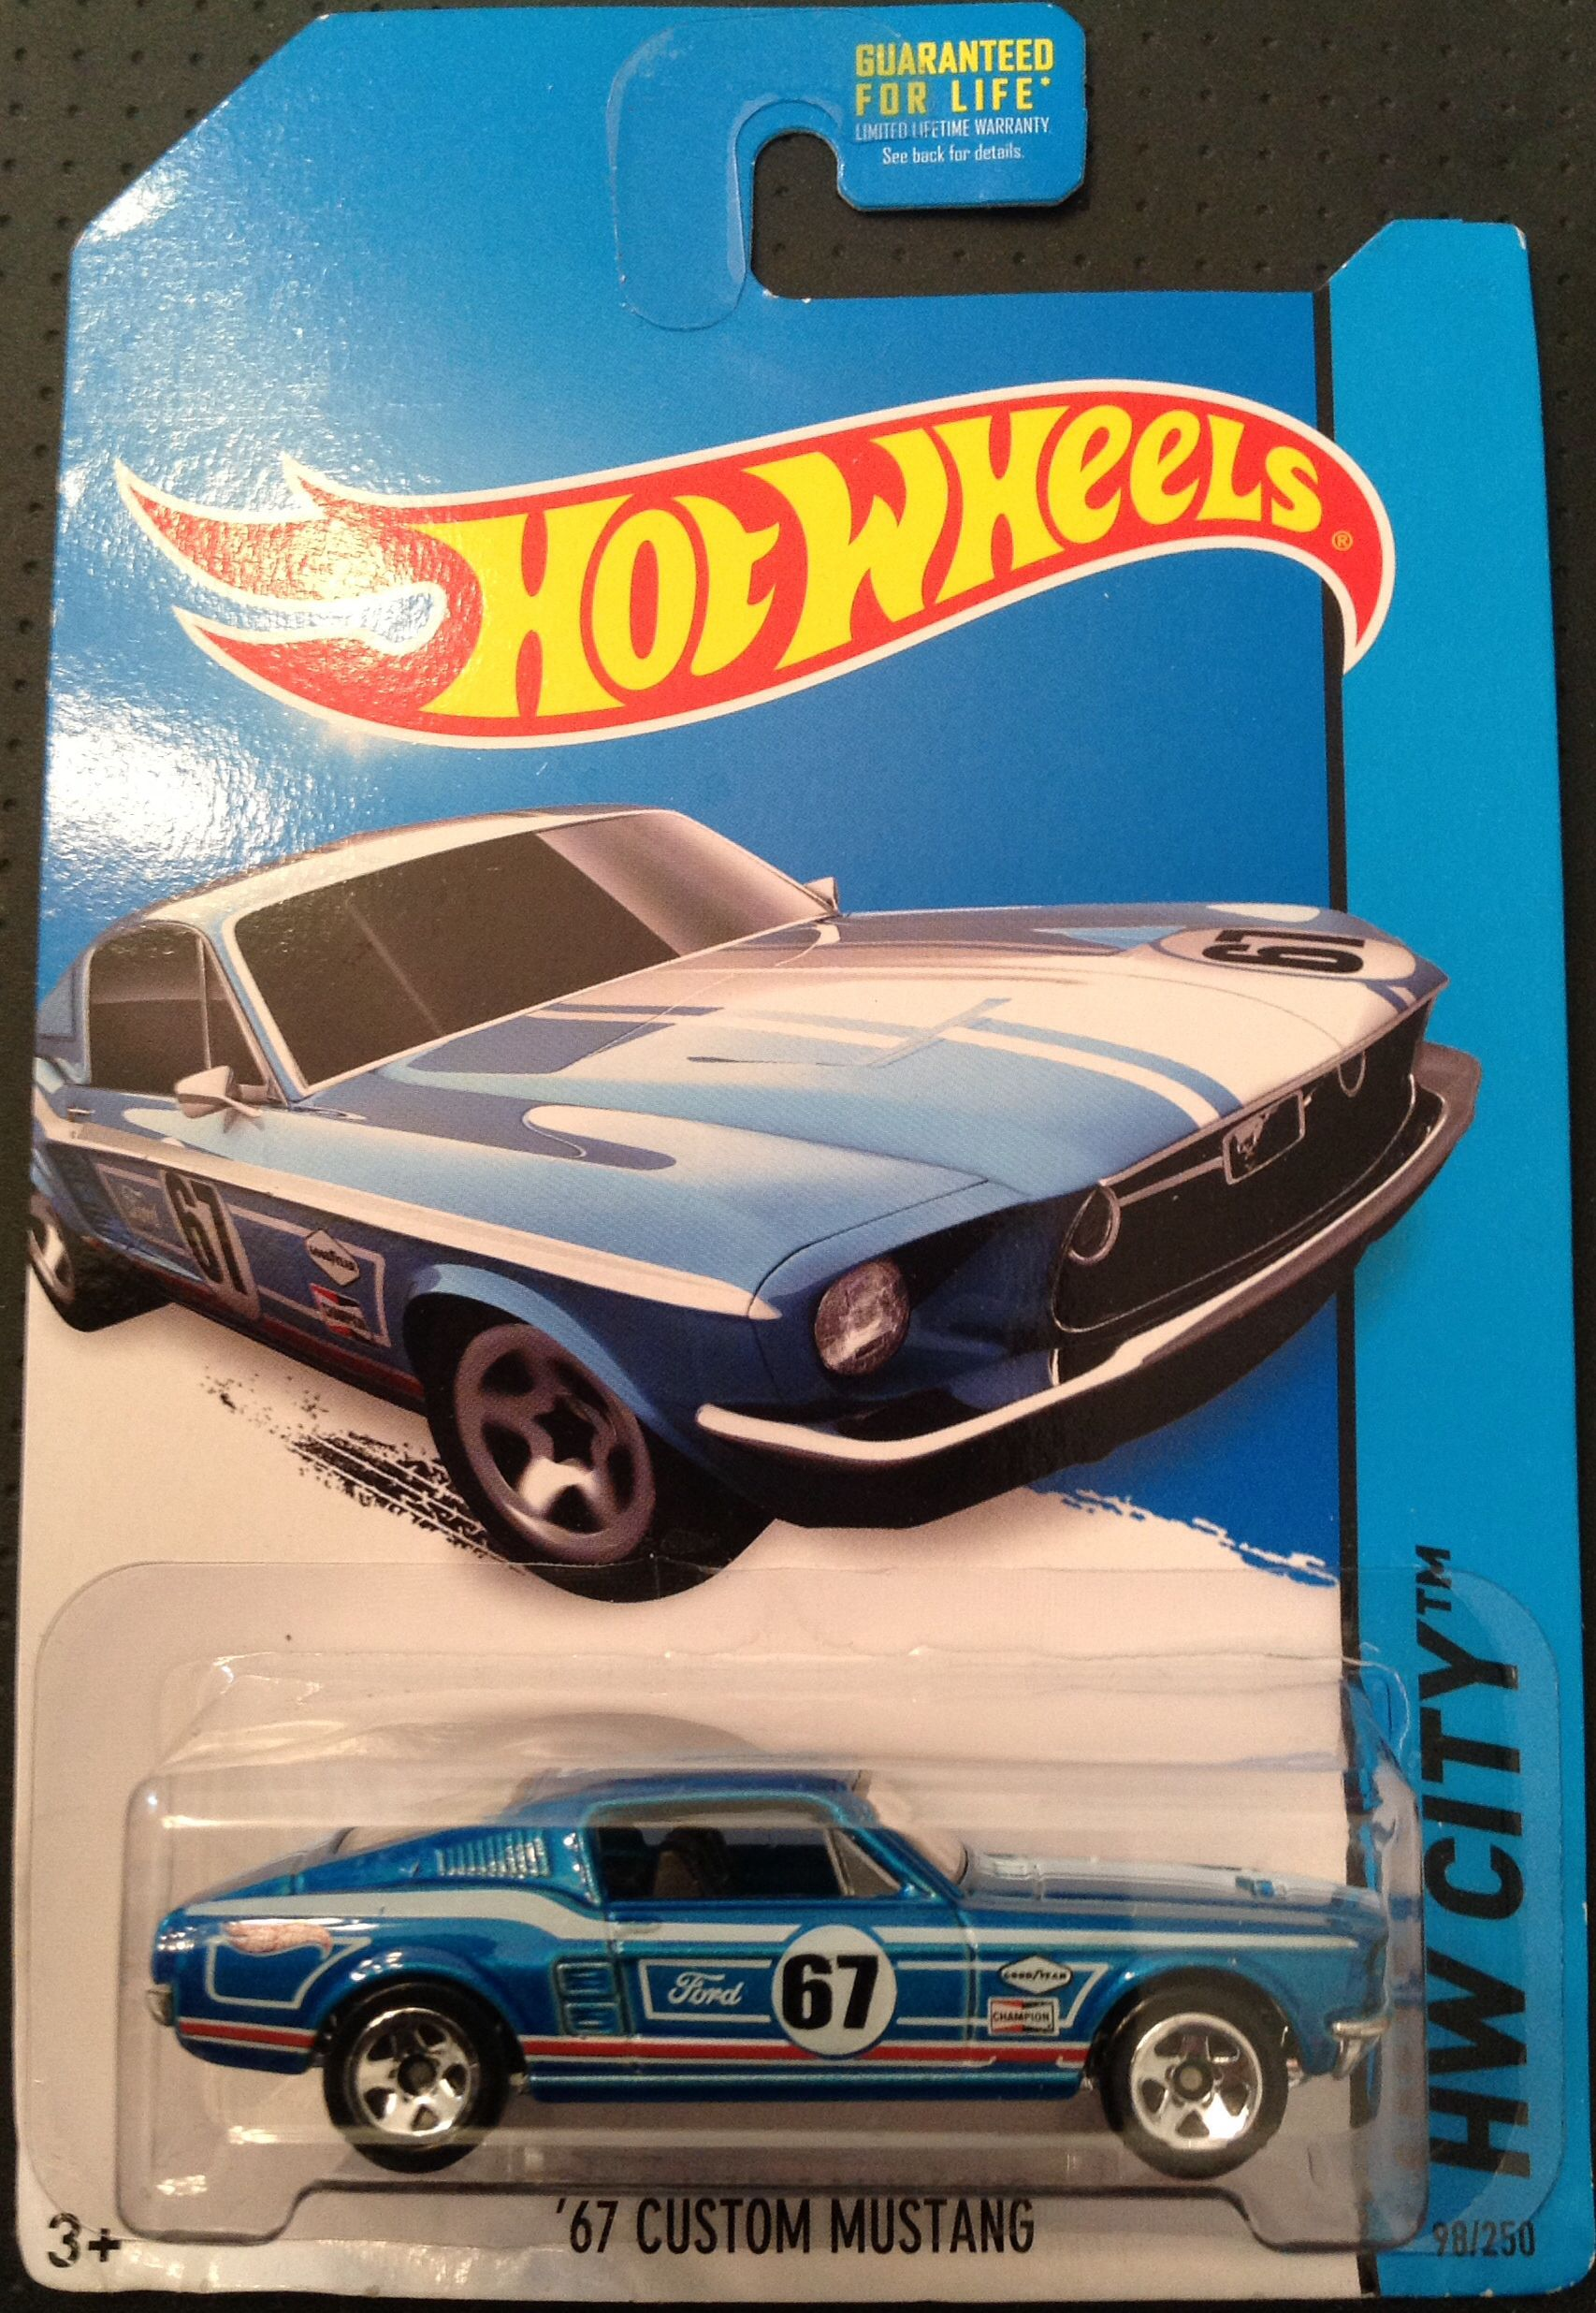 Hot Wheels 2014 Mustang 50th Hw City 98 250 67 Custom Mustang